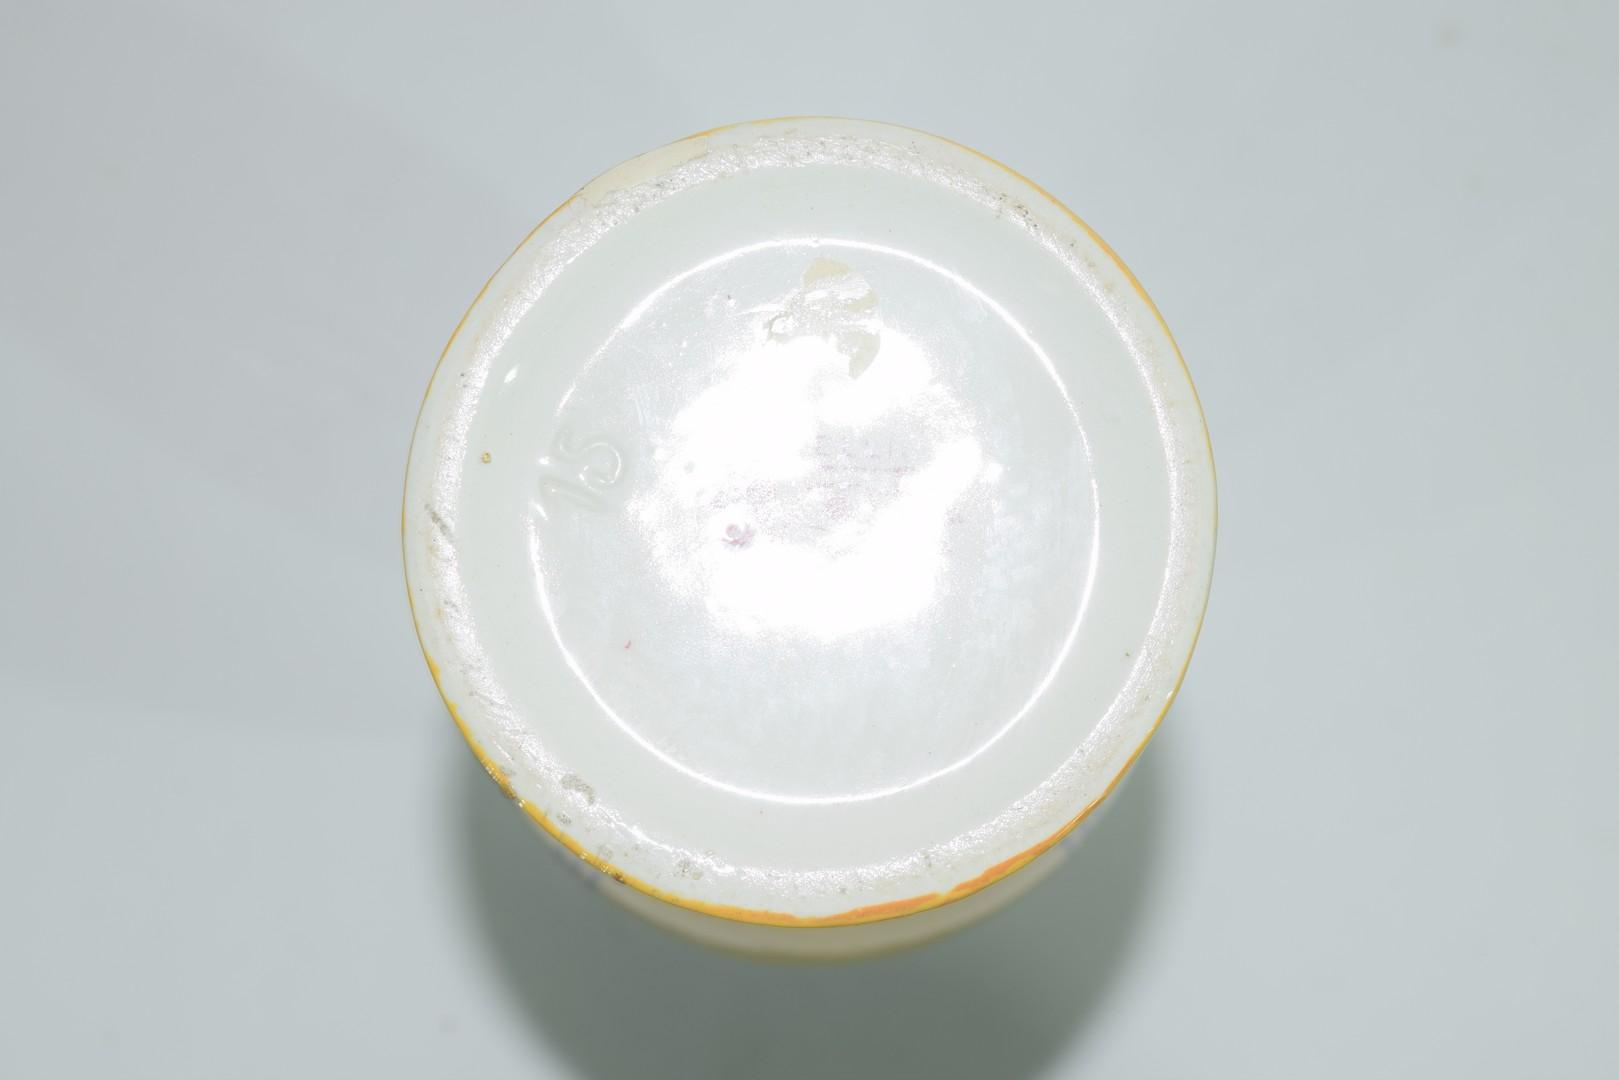 Wood & Sons Burslem vase by Frederick Rhead - Image 5 of 7